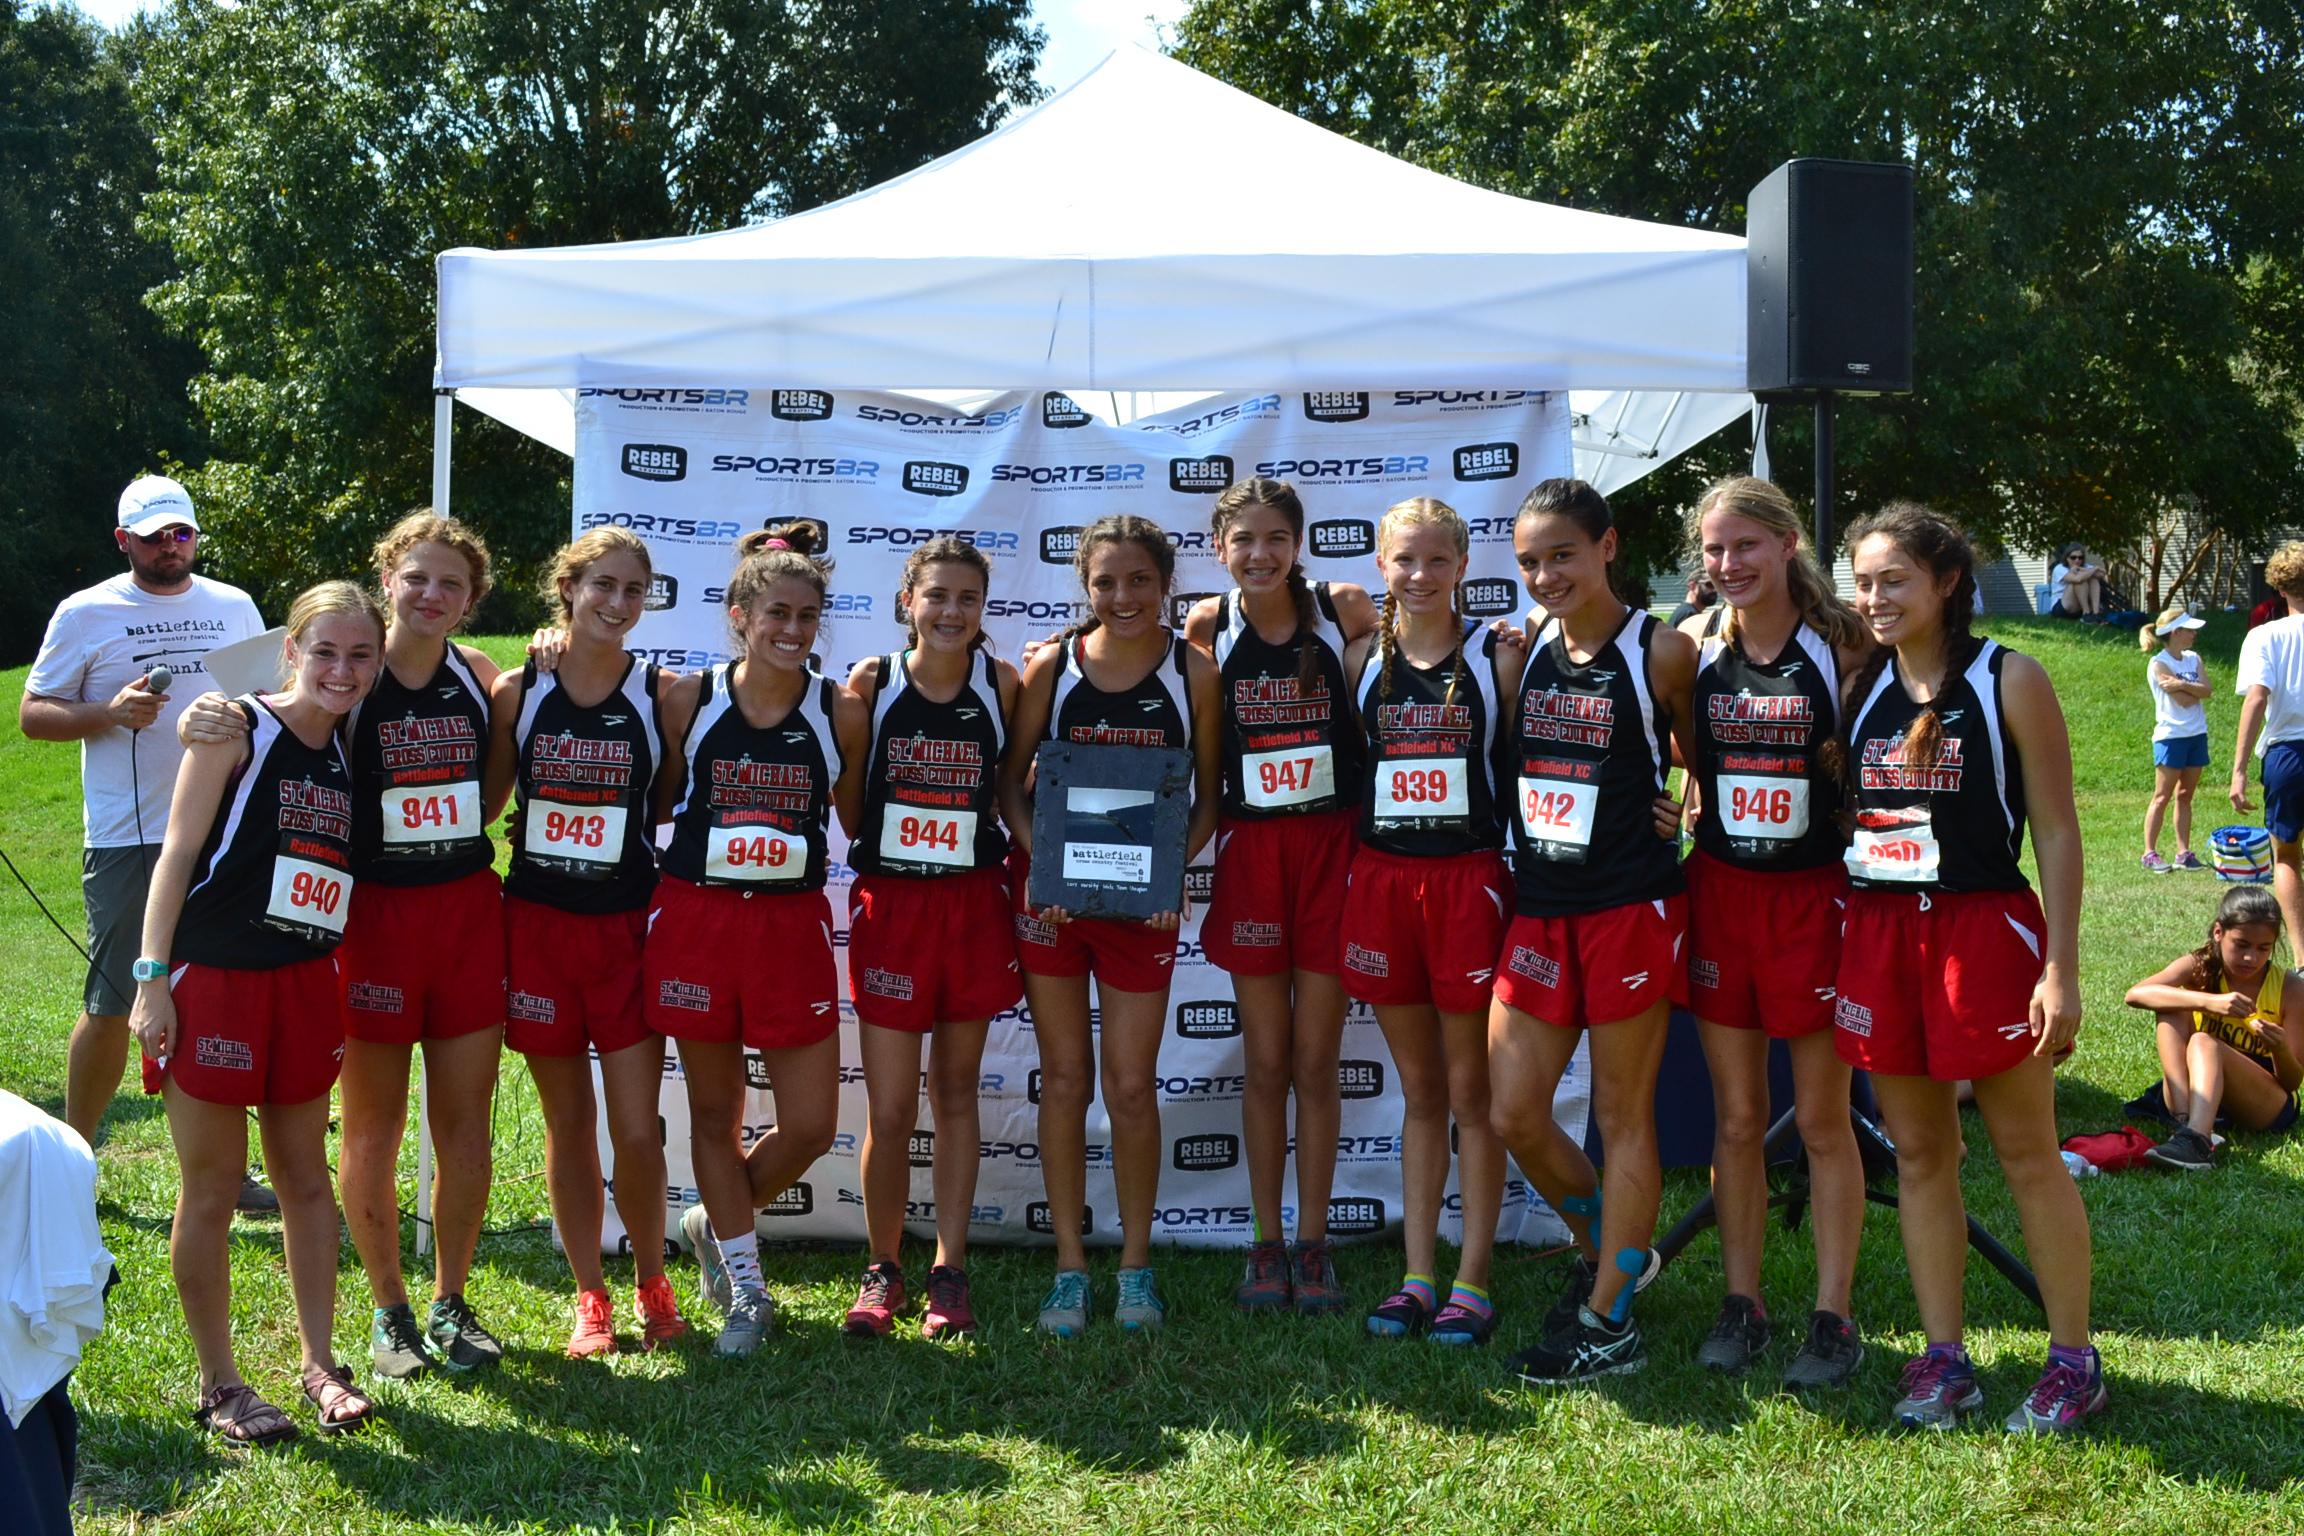 2017 Girl's High School Champions - St. Michael's